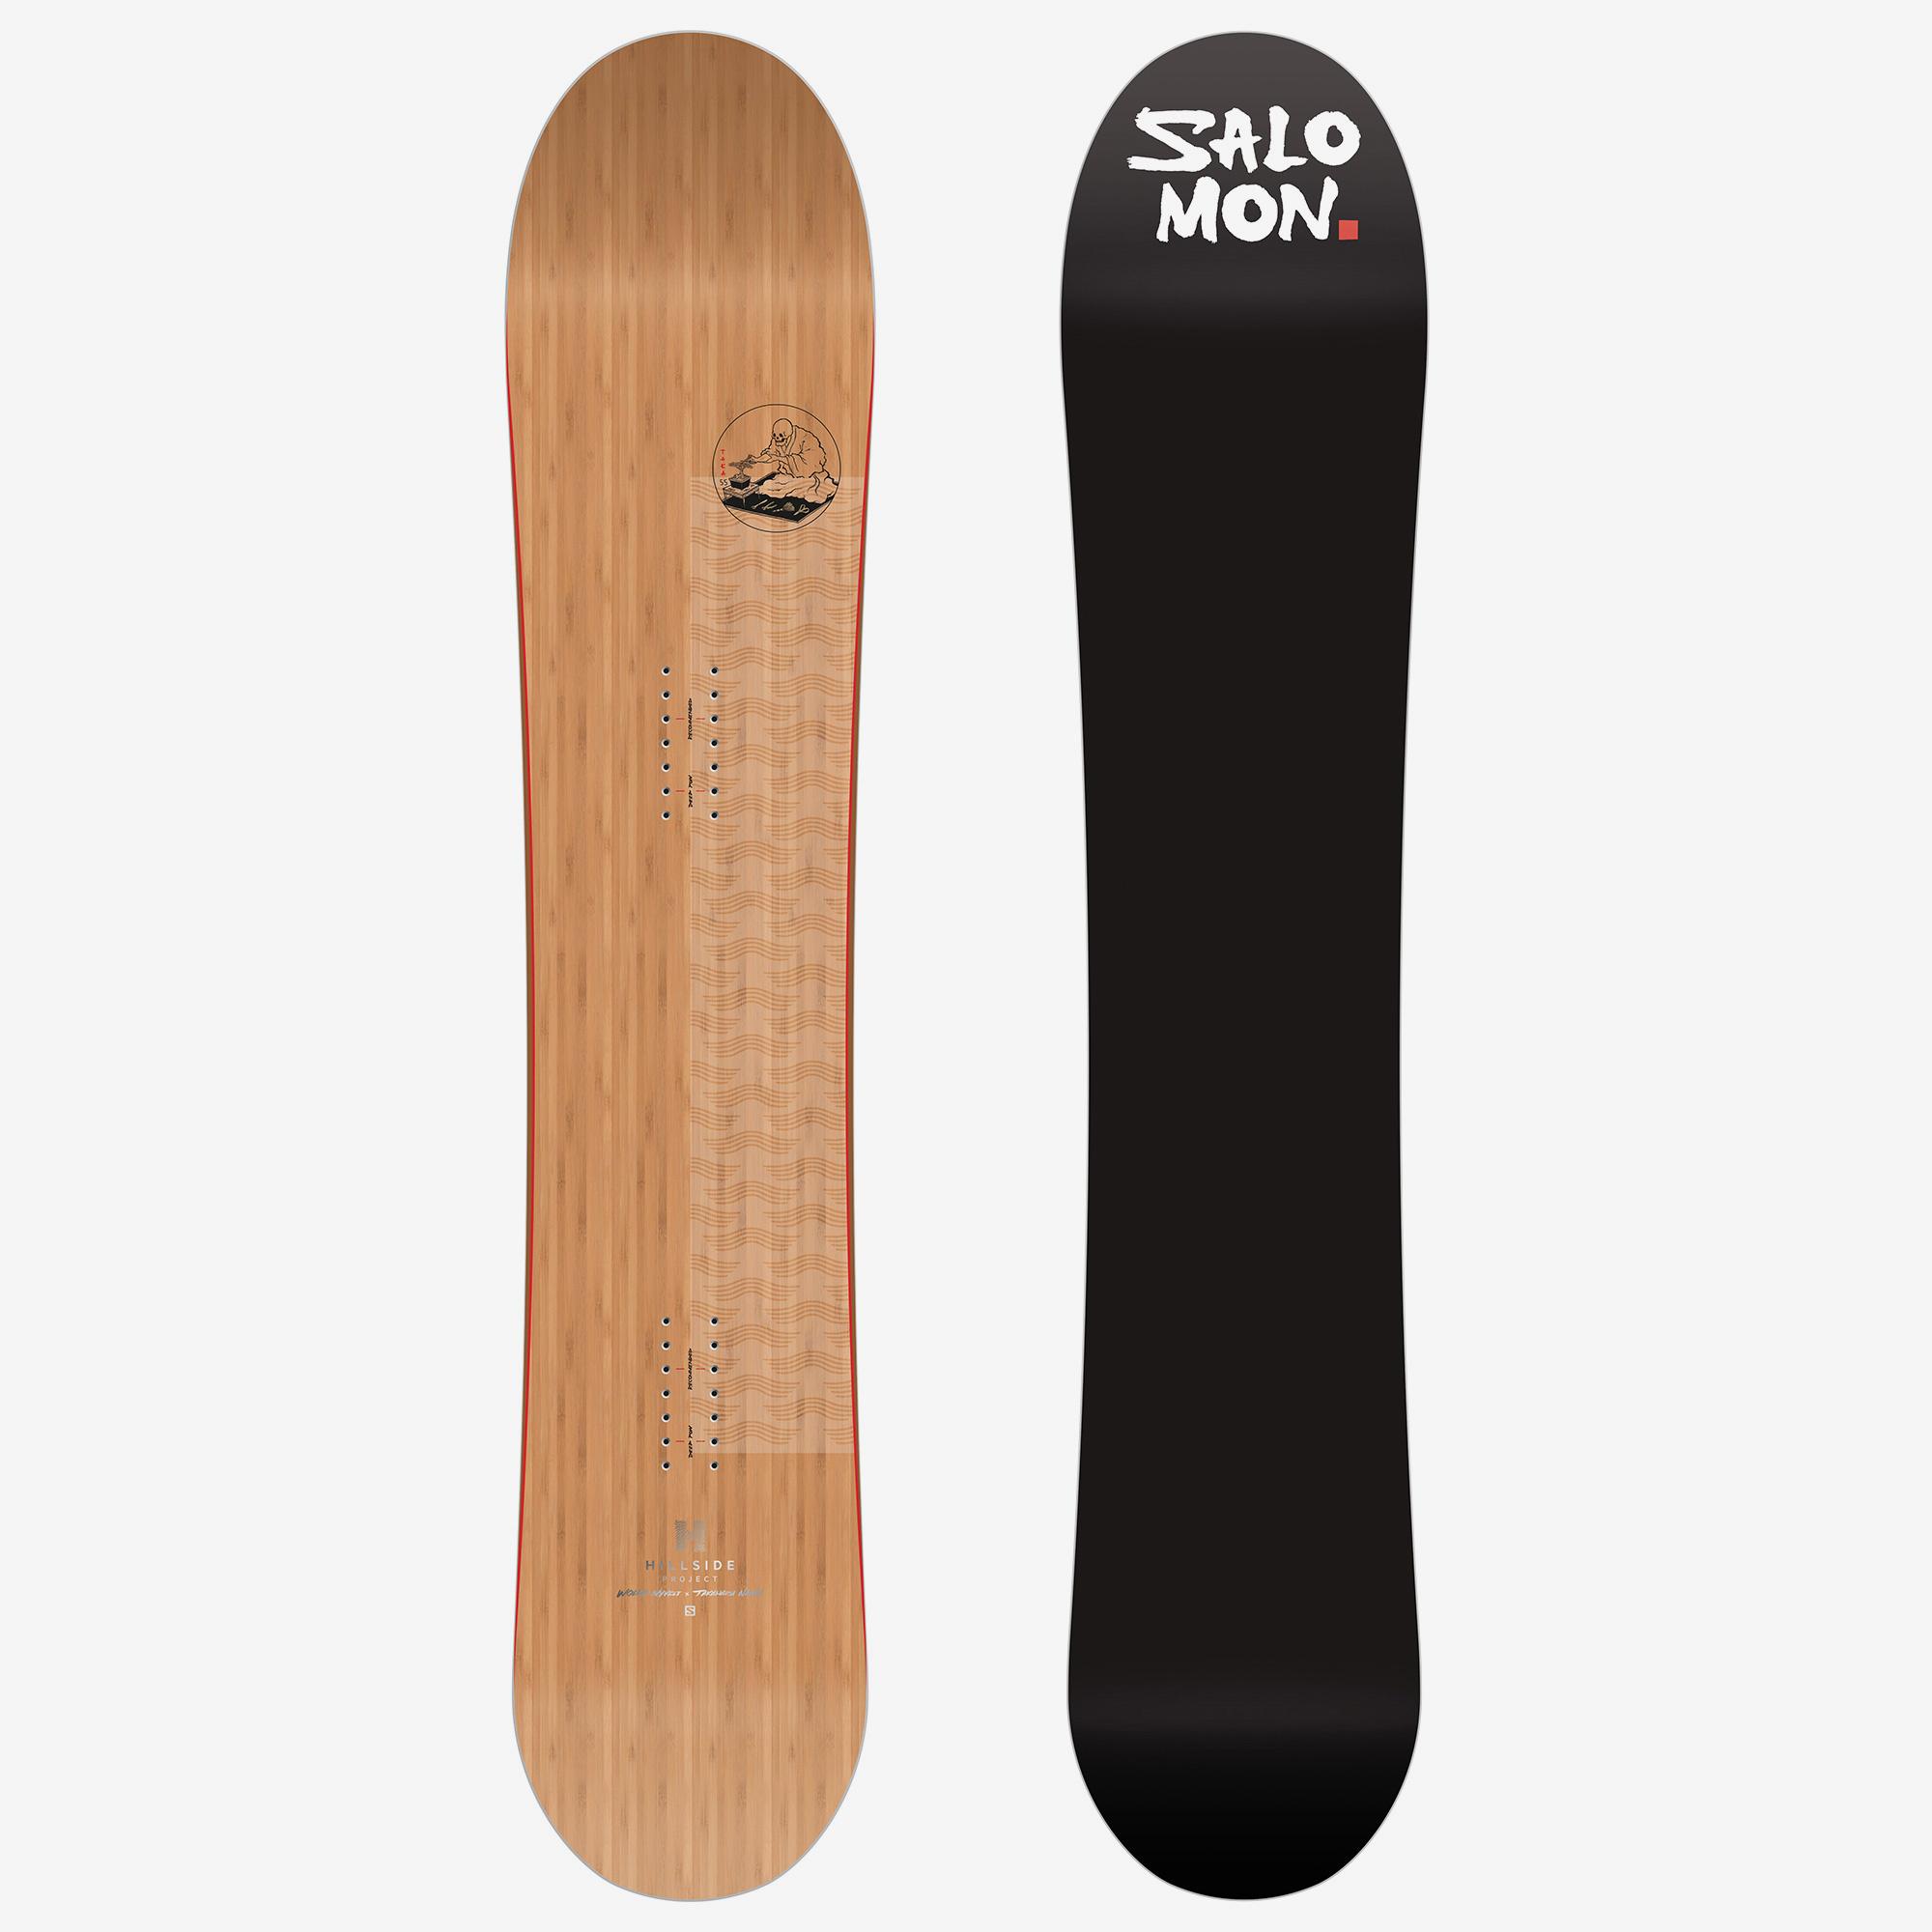 Salomon 20 SALOMON TAKA X WOLLE